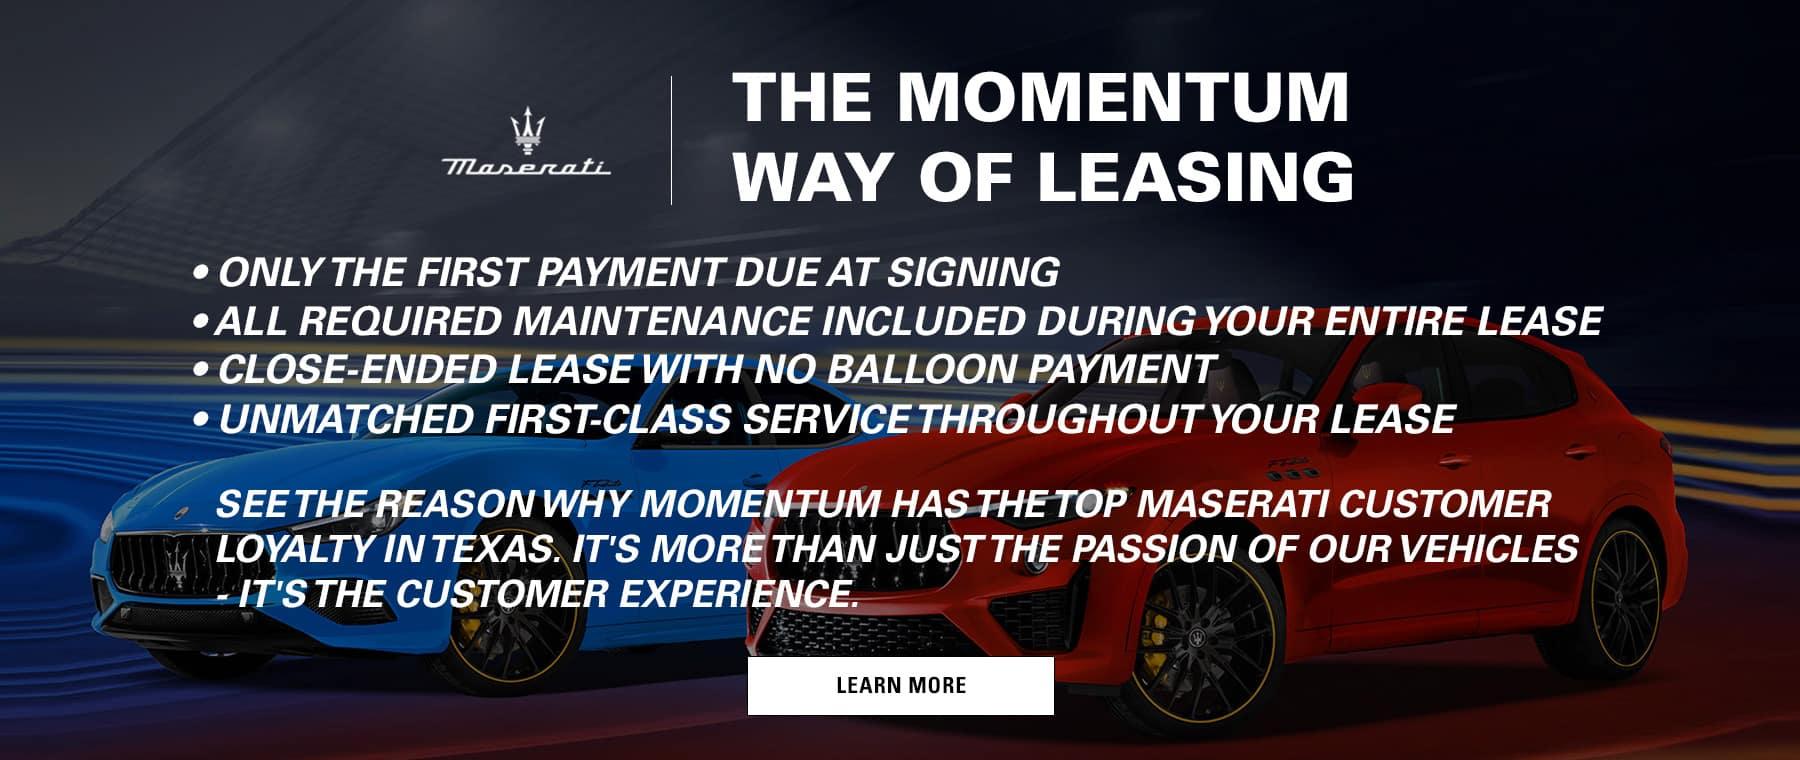 Momentum Maserati Lease 1800x760